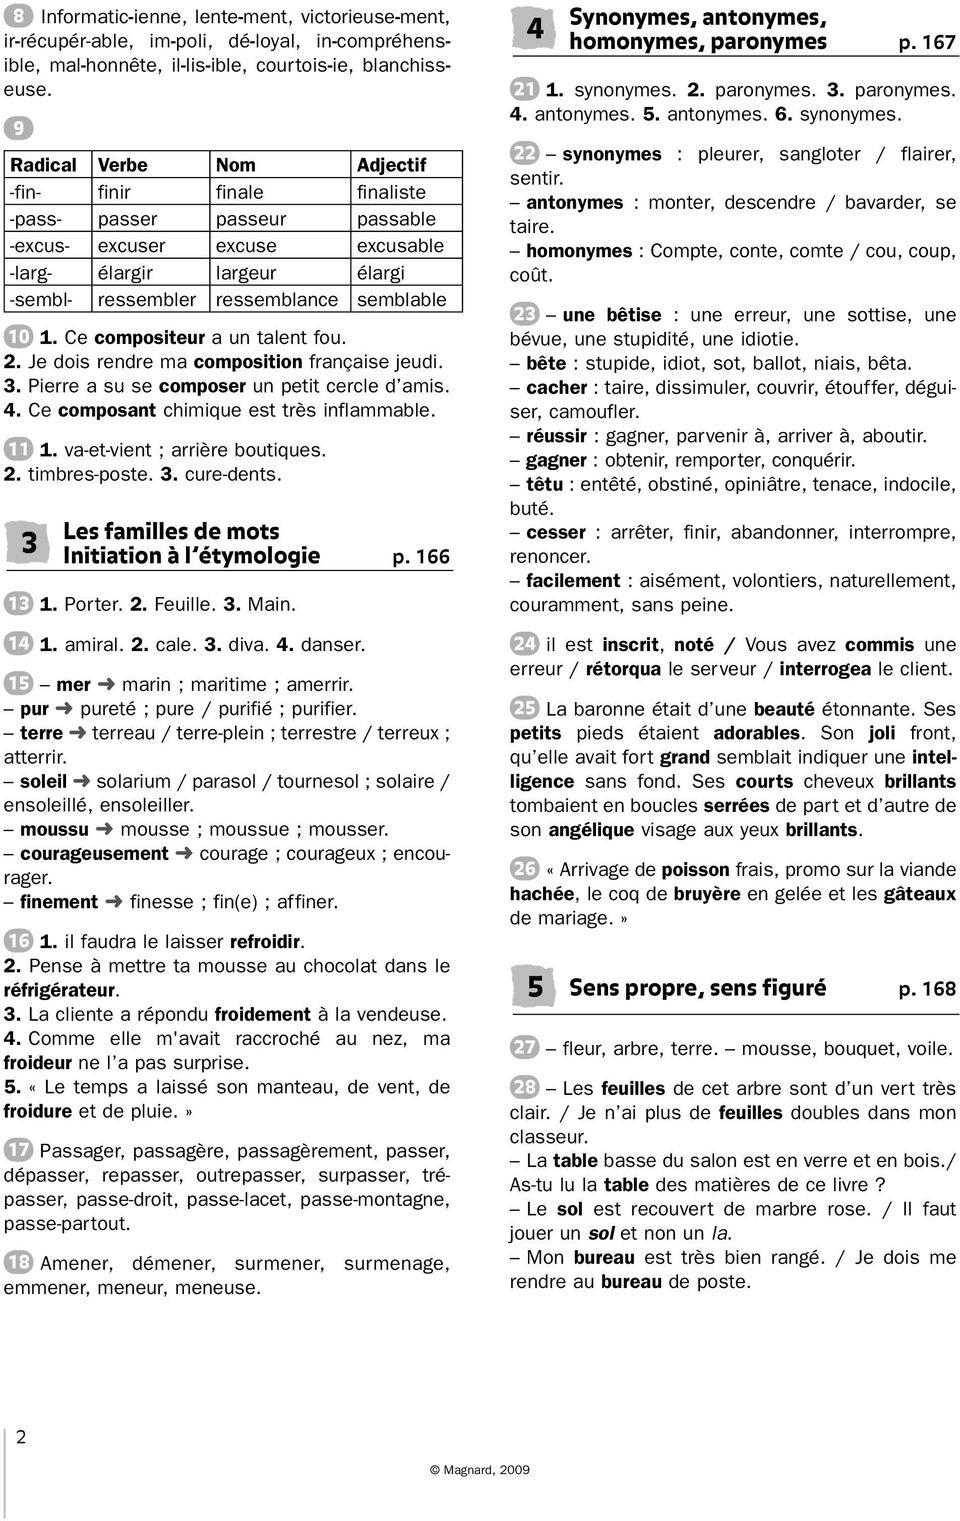 Synonyme De Oreille De Mer Solutions Pour Oreille*de*mer pour Mots Fleches Solutions Gratuites